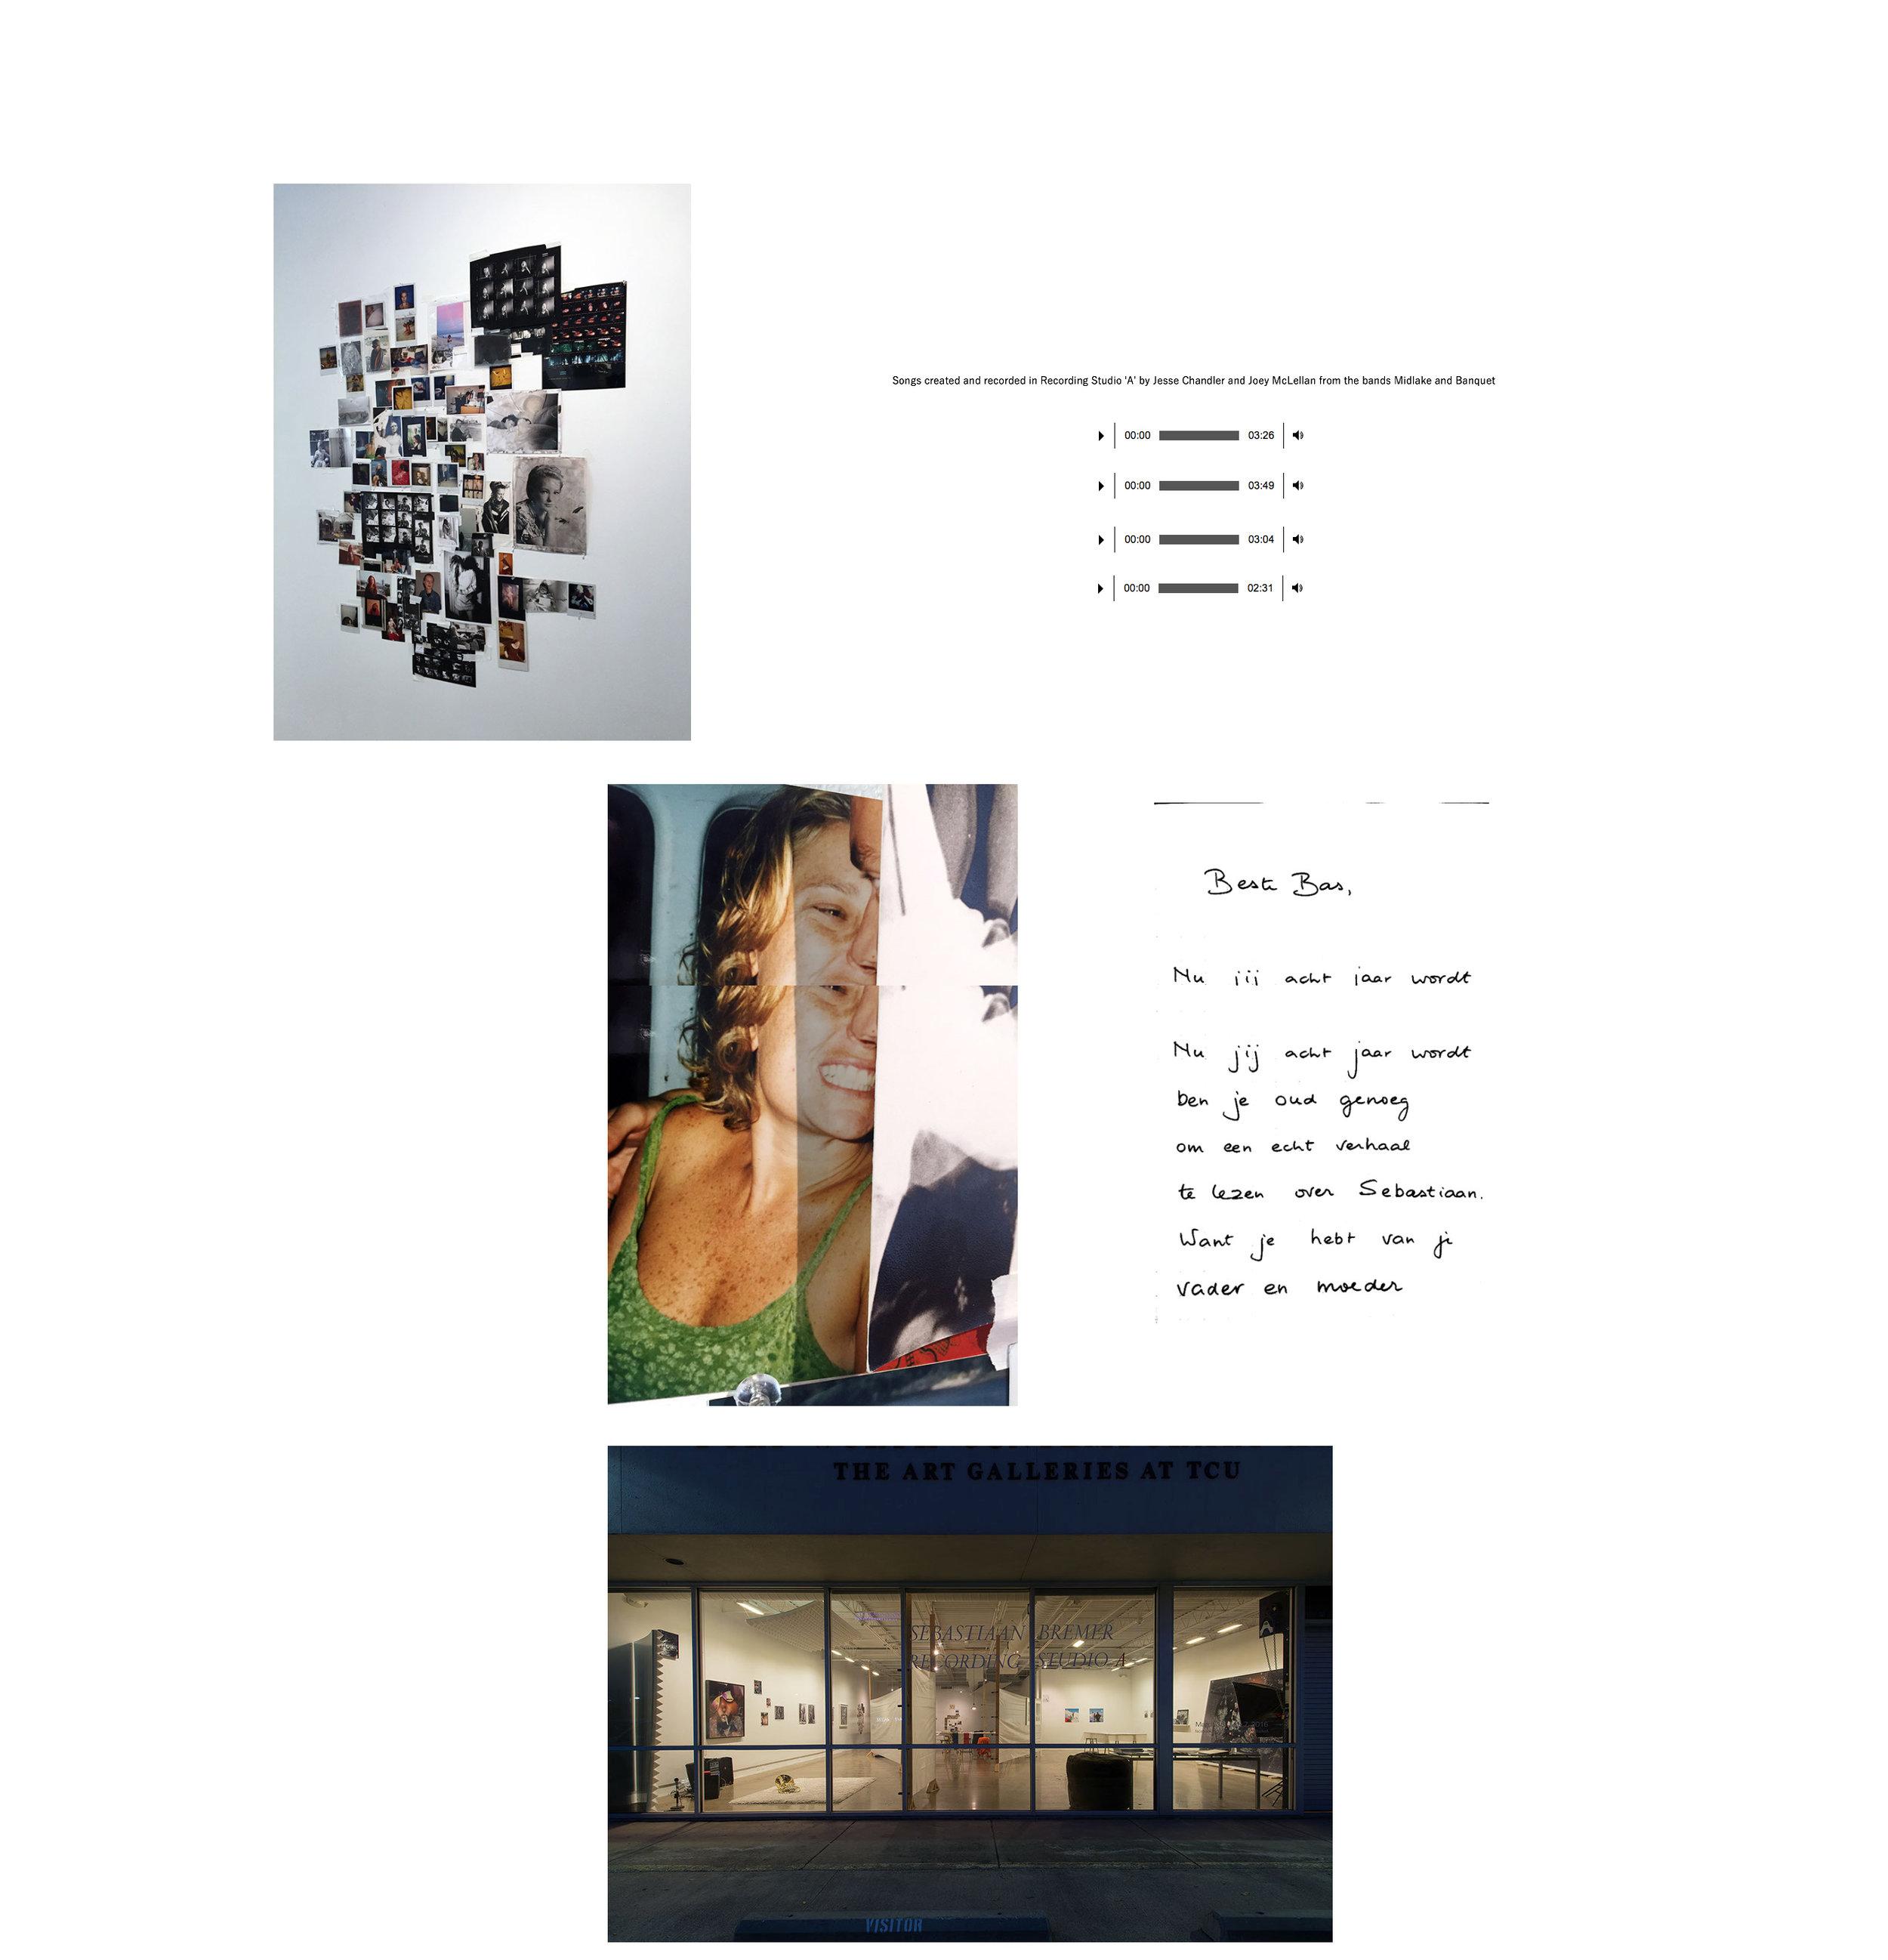 recordingstudioa_website_documentation_final_1.jpg